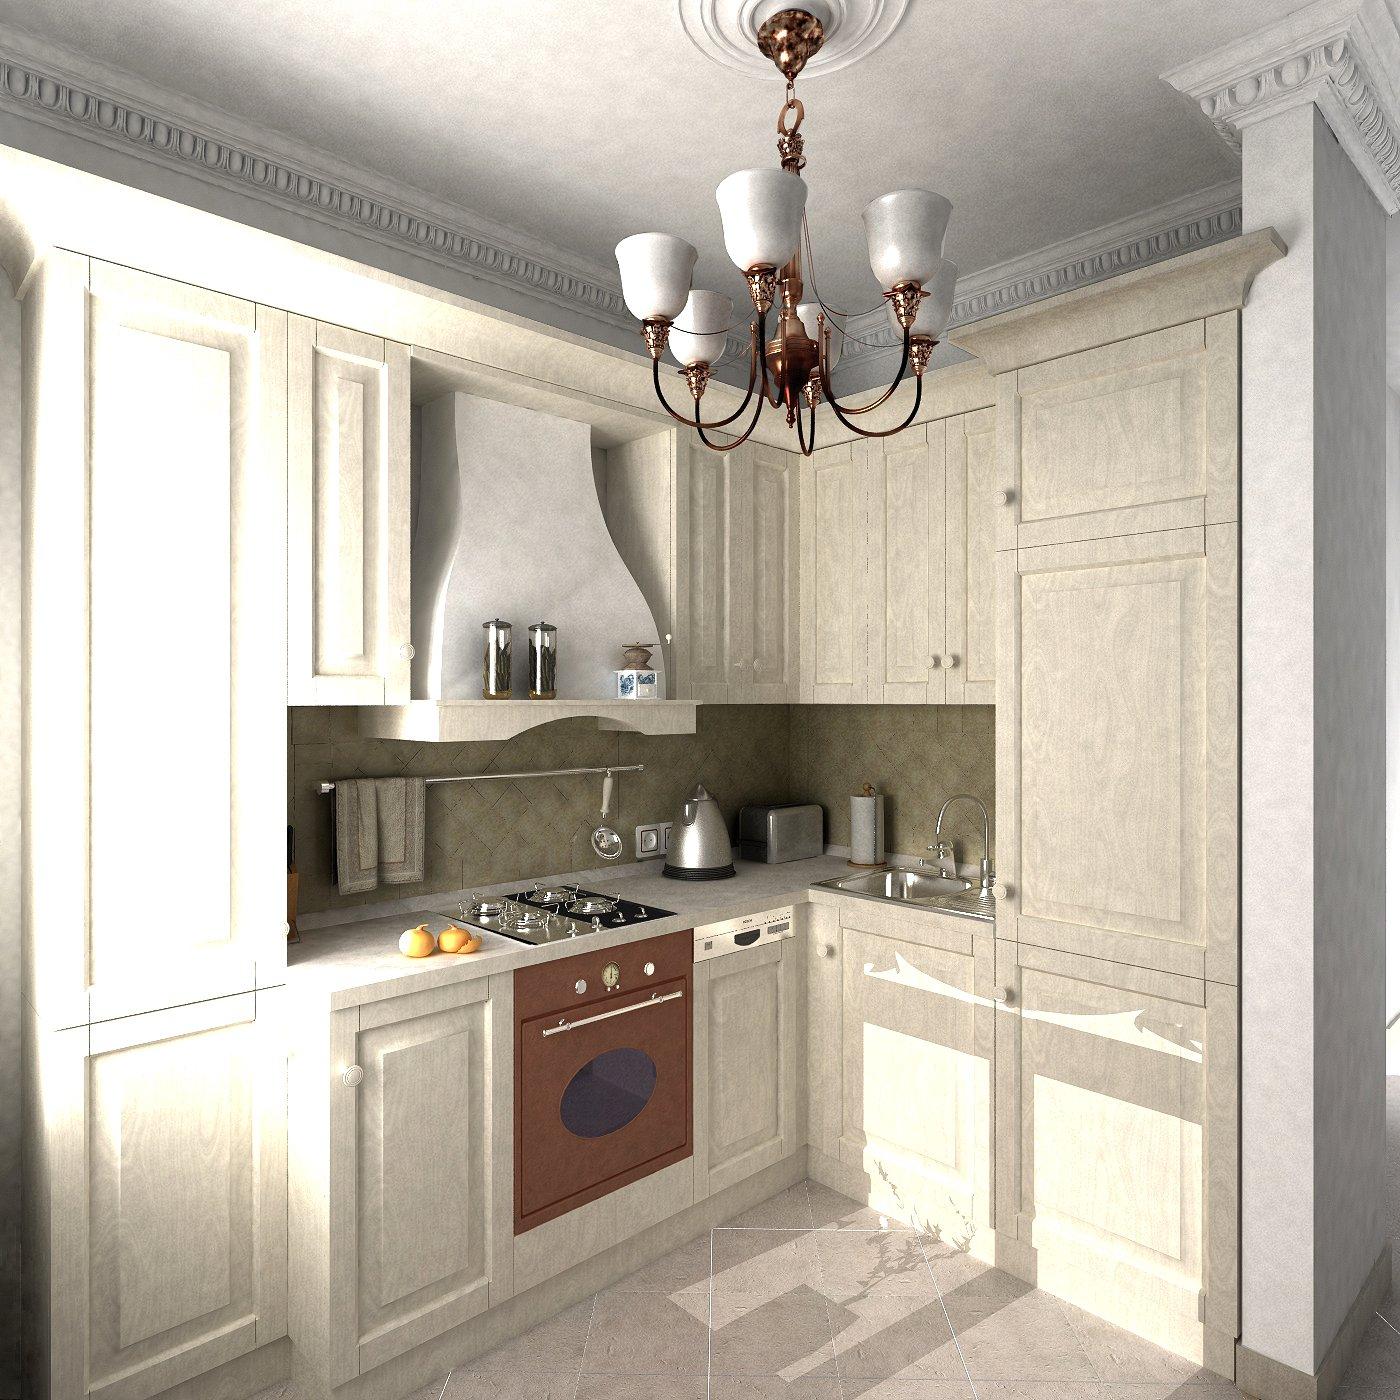 угловые кухни в стиле прованс фото